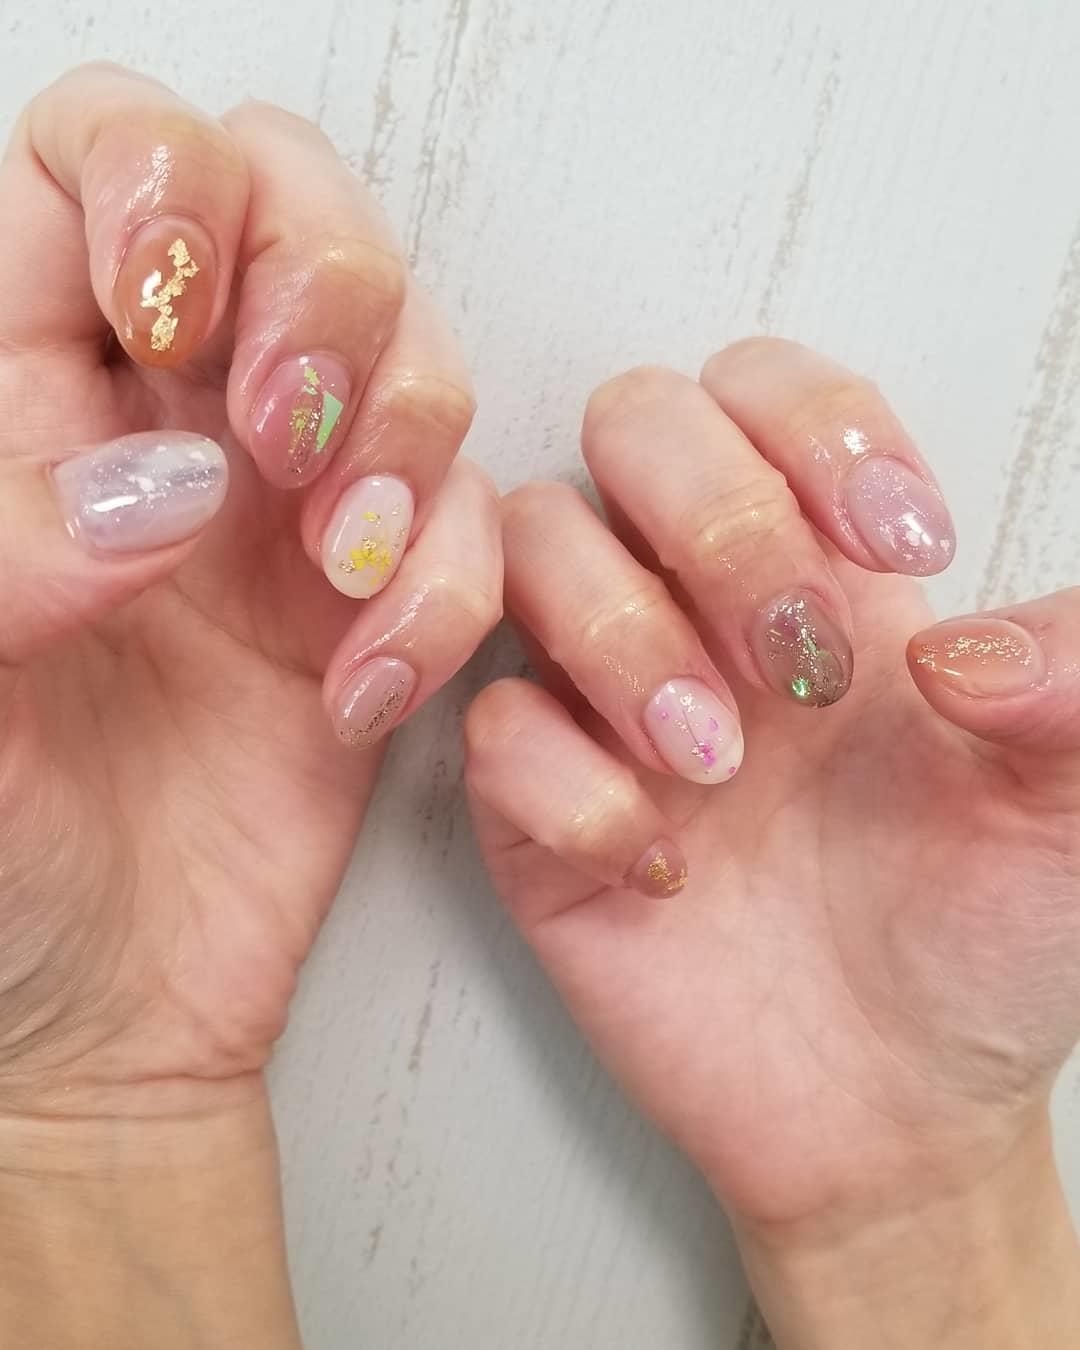 inspiring winter nail designs 2019 20 - Inspiring Winter Nail Designs 2019